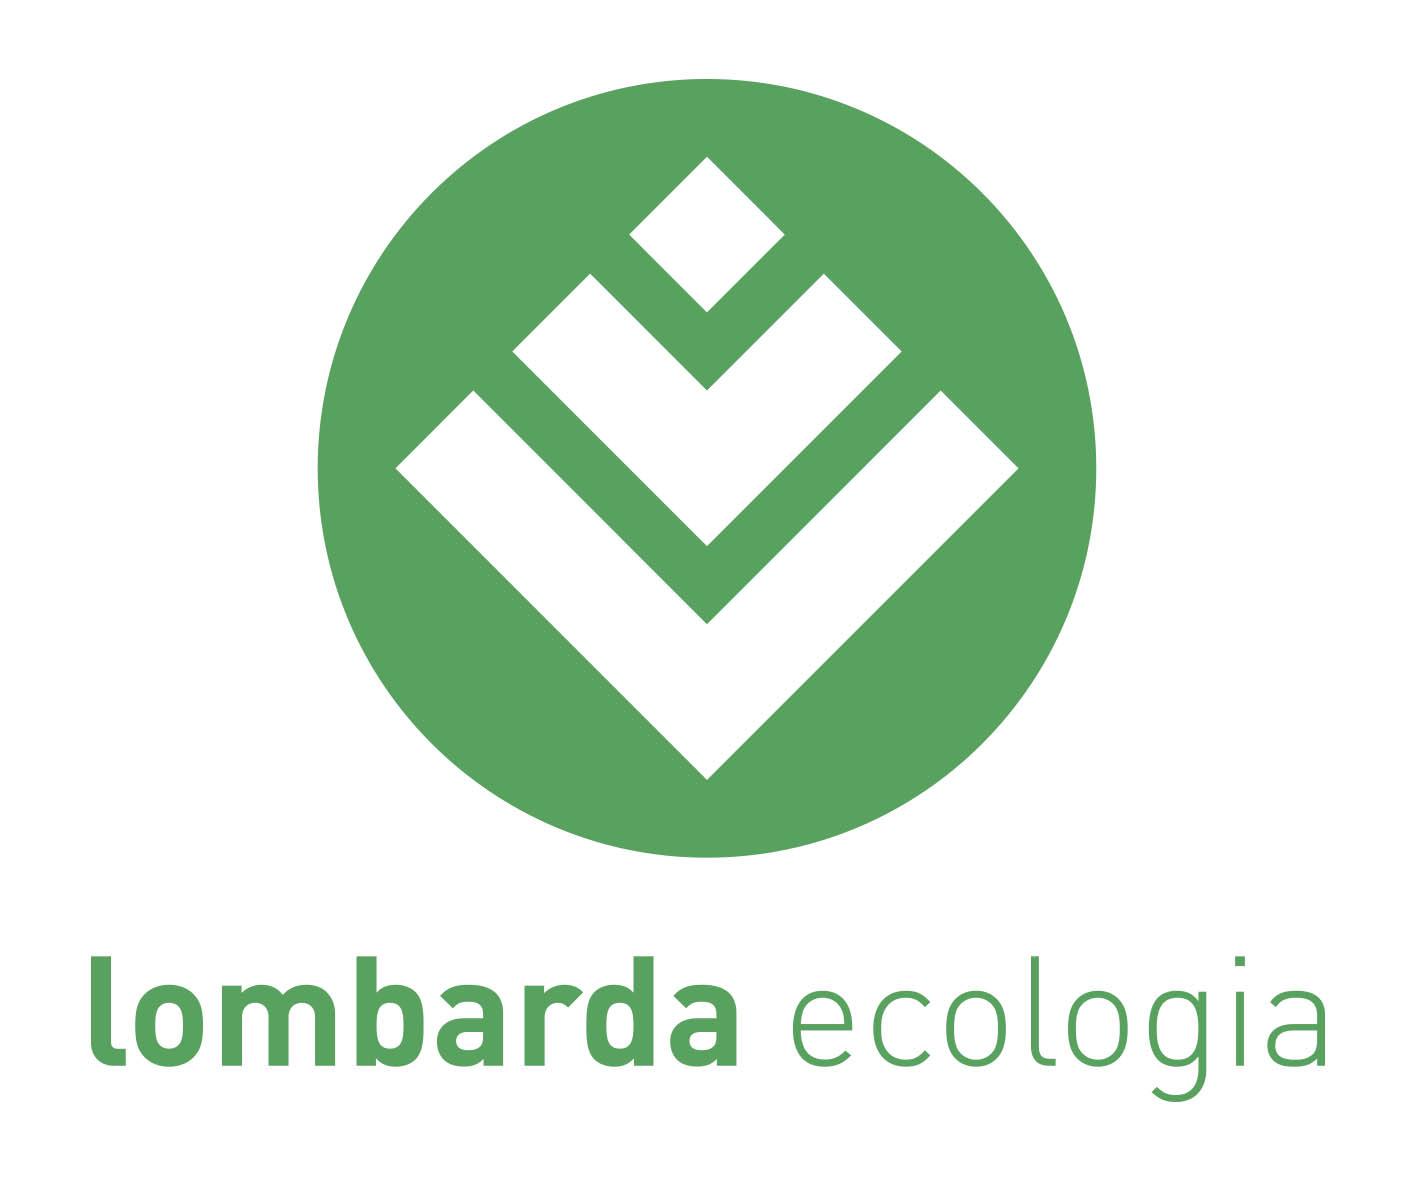 logo lombarda ecologia